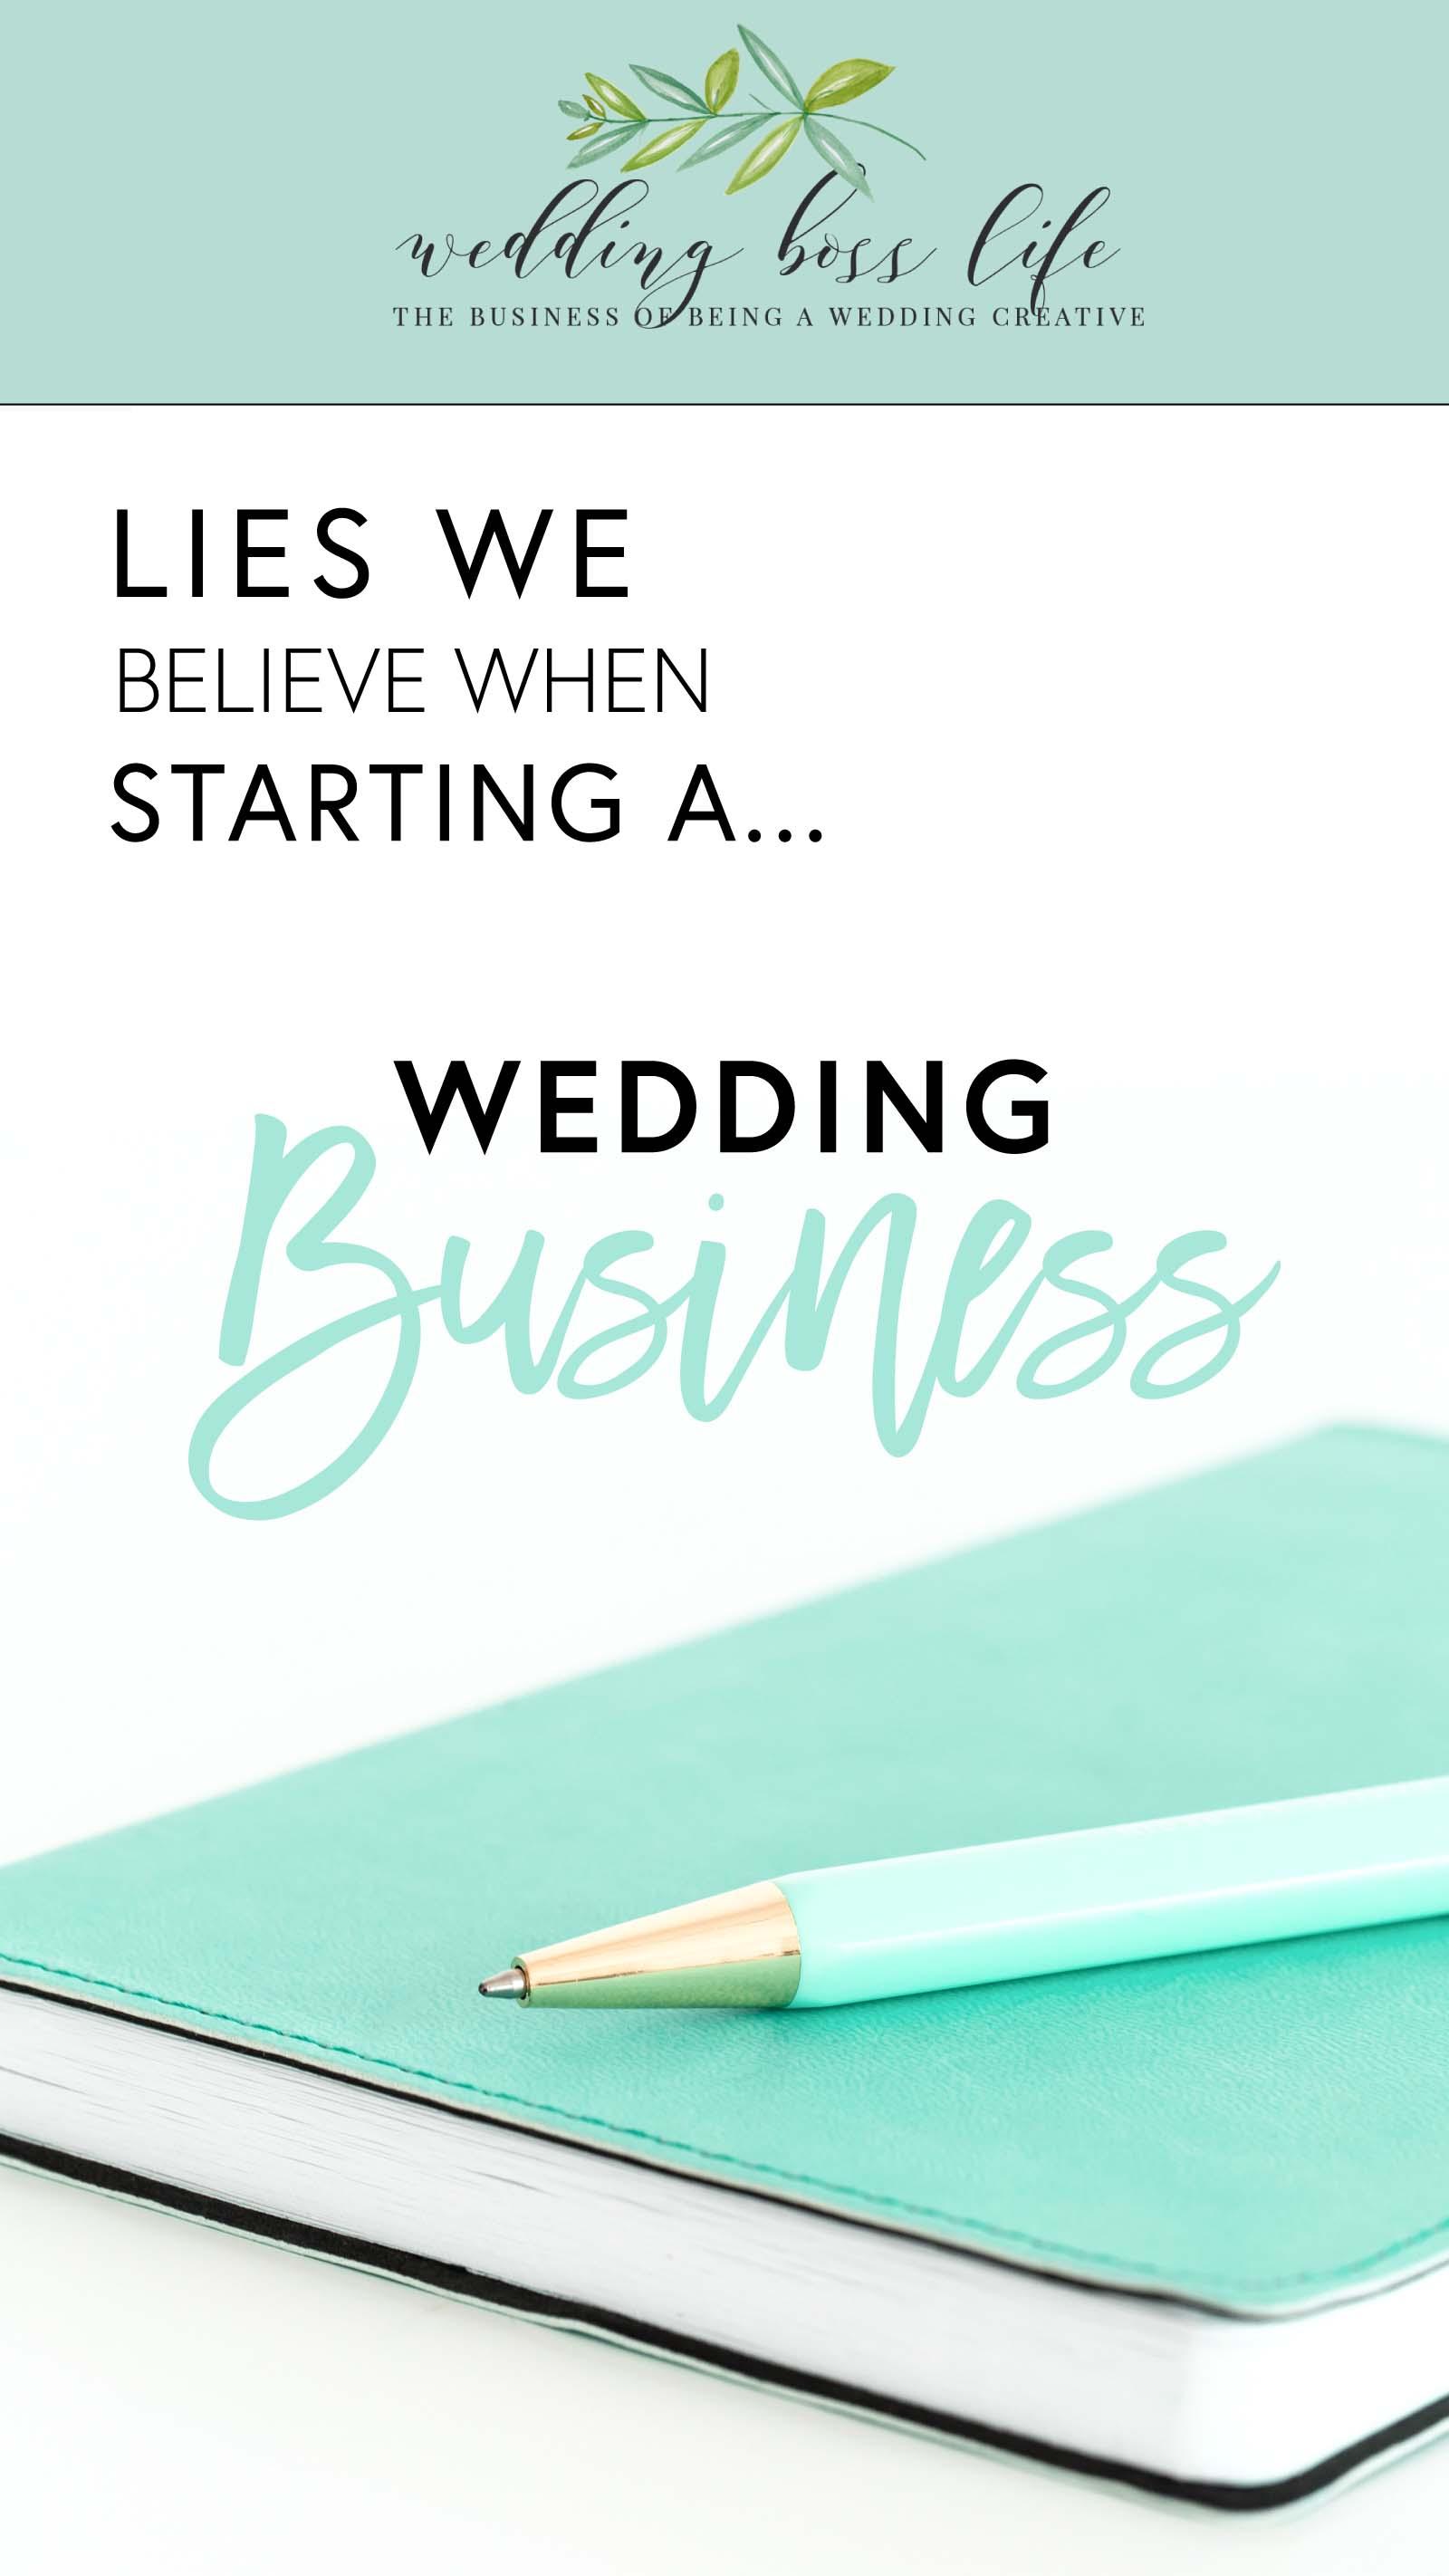 3 Lies We Believe When Starting a Wedding Business